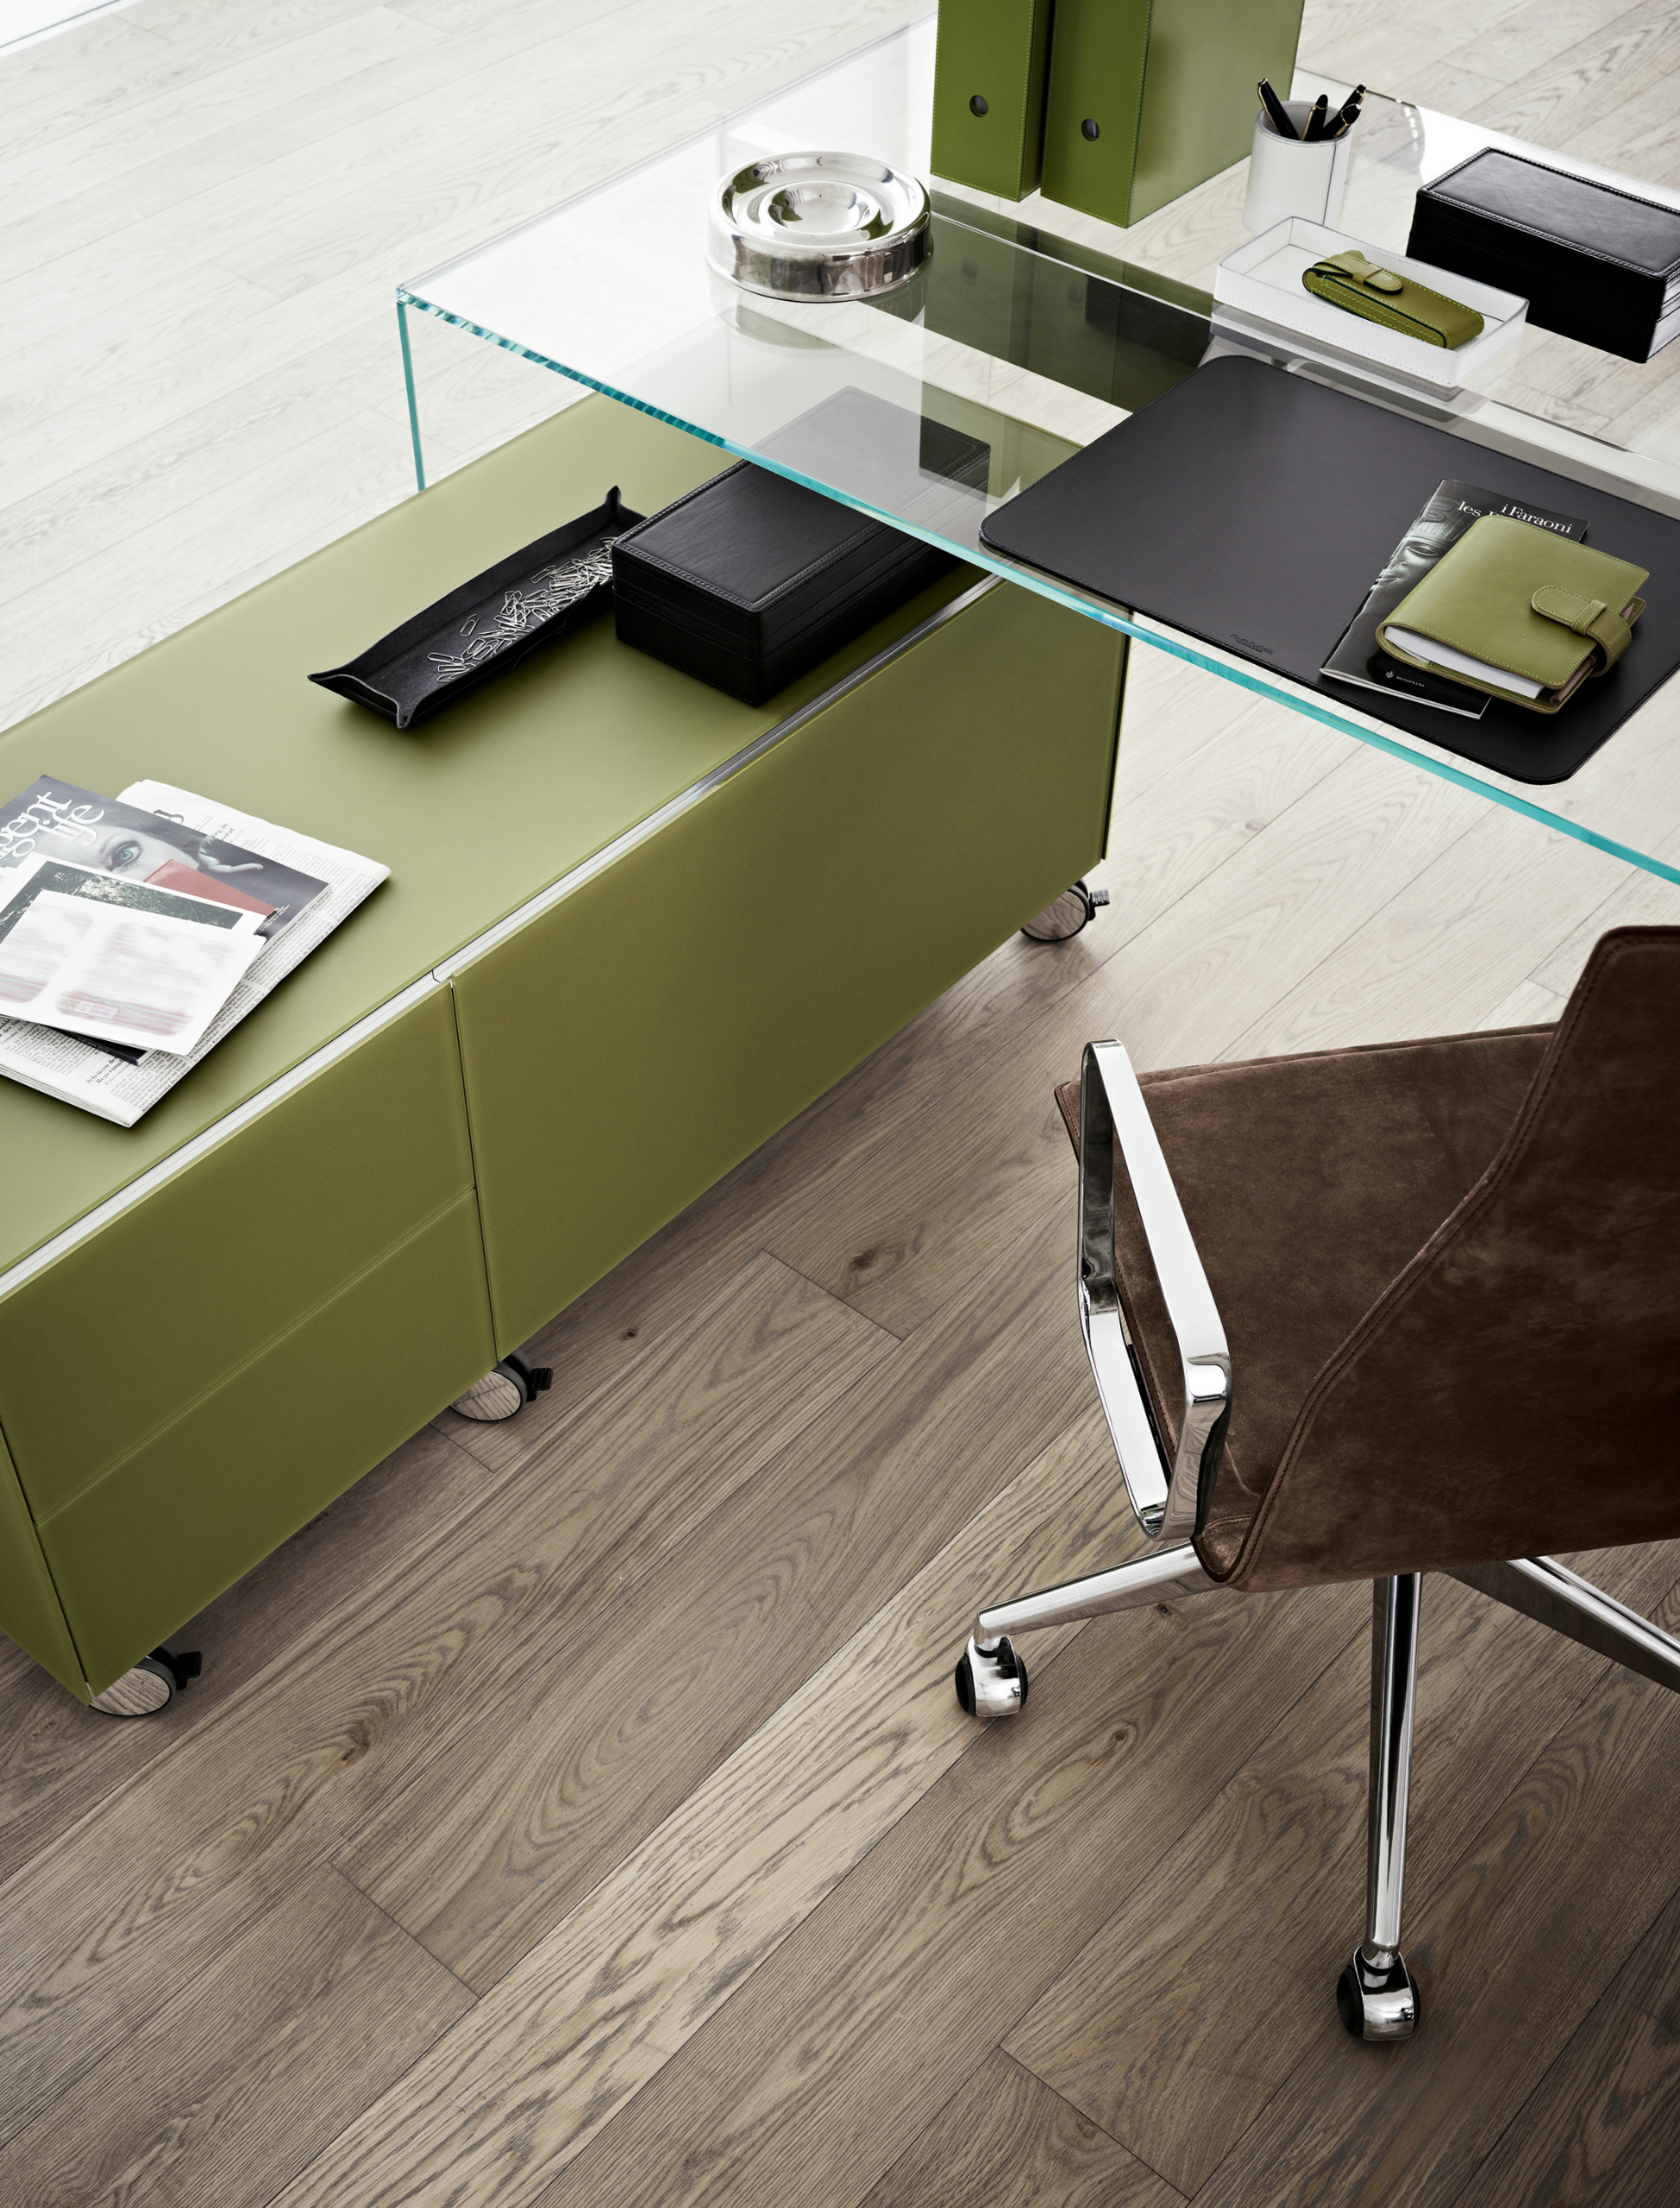 office drawer unit with casters air wheel by gallotti radice design pinuccio borgonovo. Black Bedroom Furniture Sets. Home Design Ideas